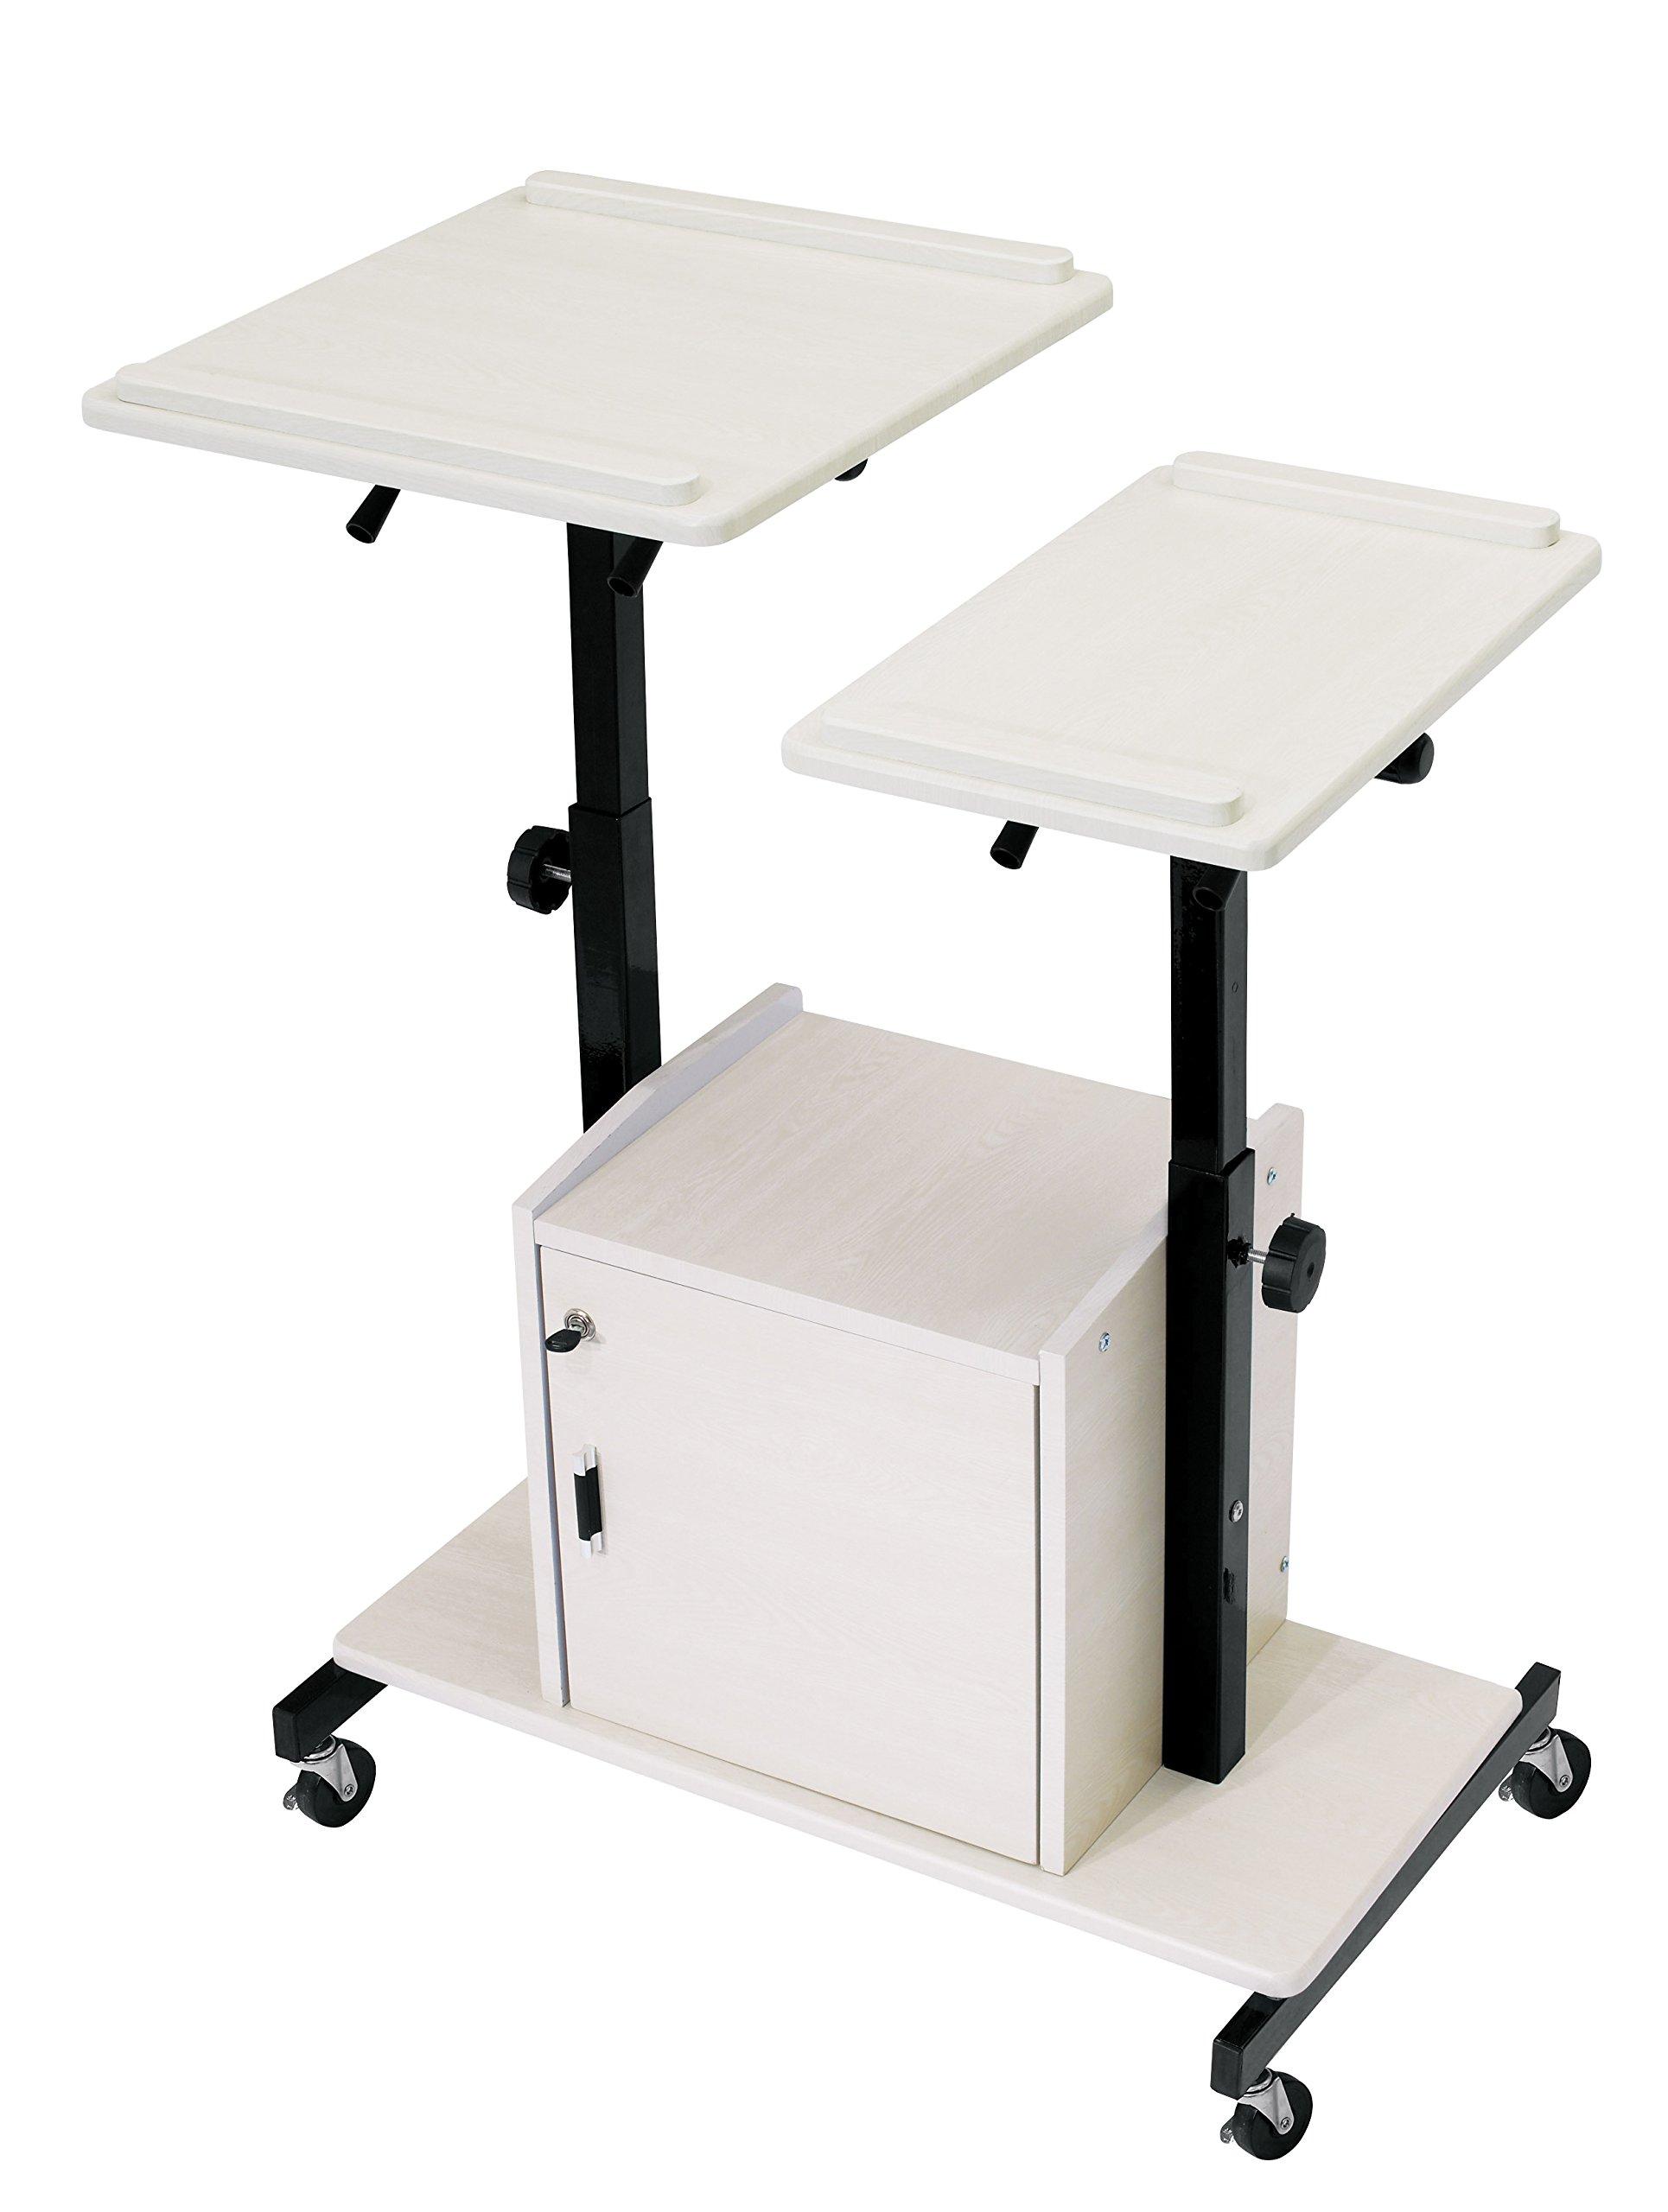 Oklahoma Sound PRC300 Steel Deluxe Presentation Cart, 32'' Width x 44'' Height x 24'' Depth, Ivory Woodgrain/Black